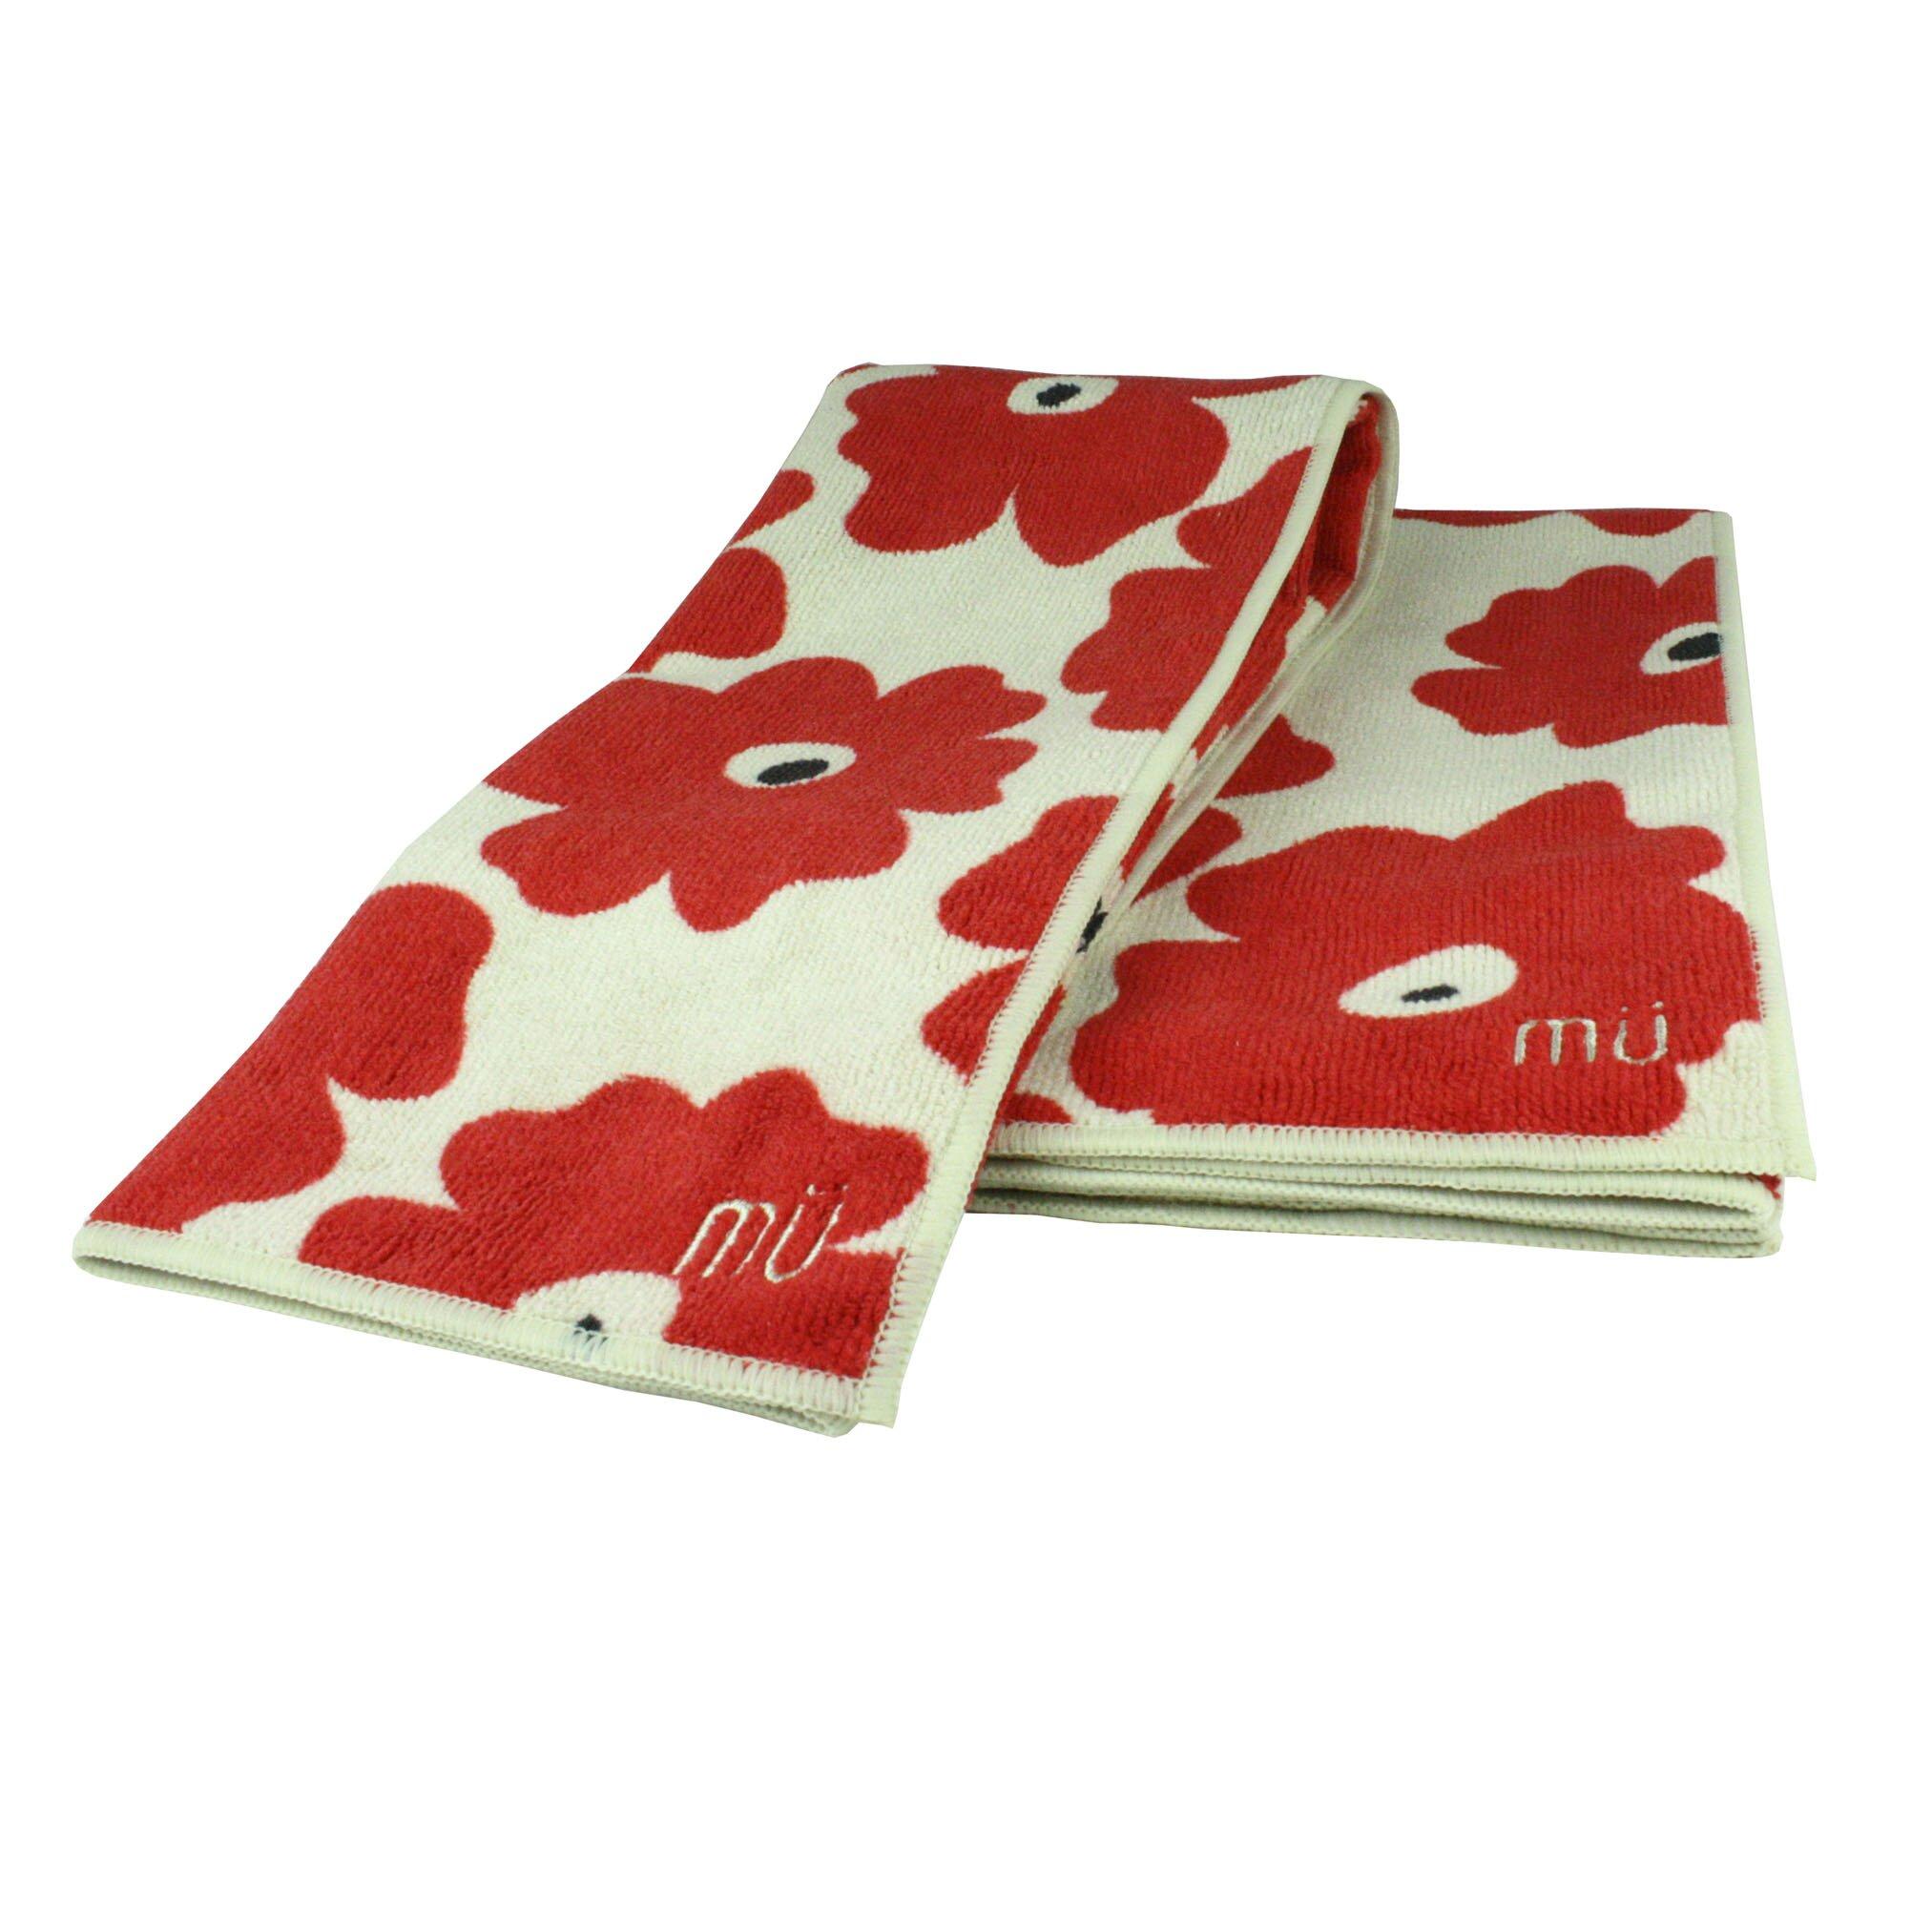 Mu Kitchen: MU Kitchen Poppy Towel & Reviews